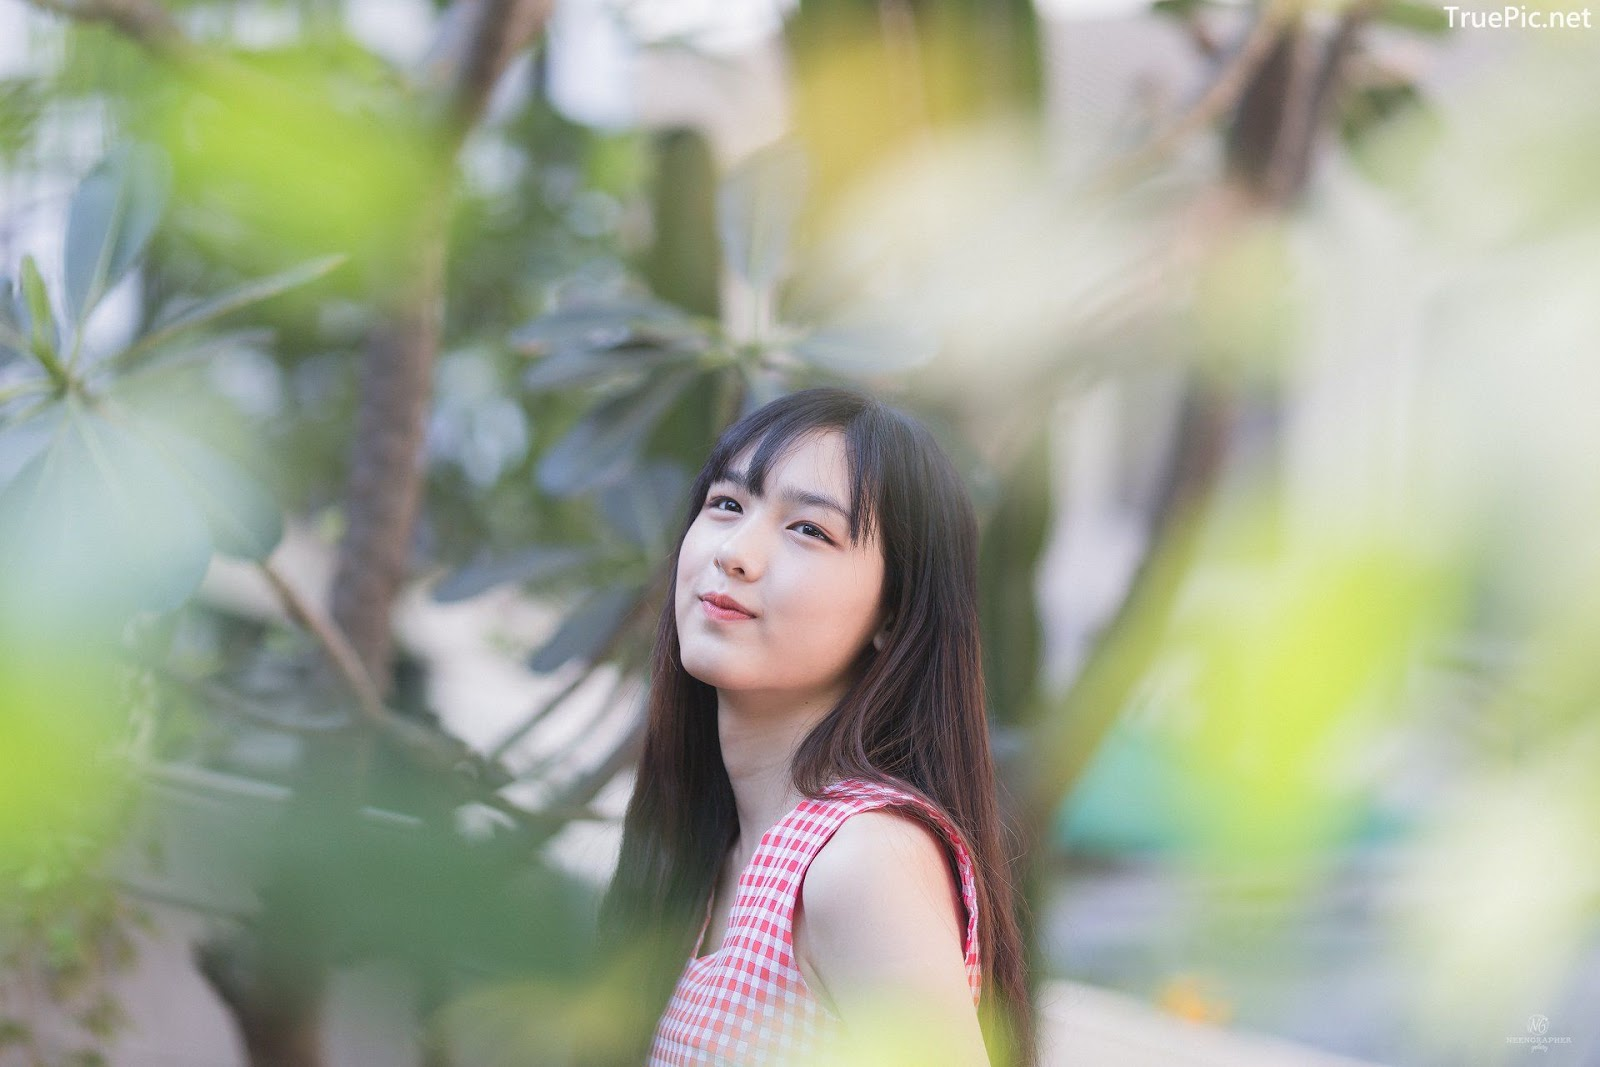 Image-Thailand-Cute-Model-Emma-Panisara–Album-Emma-Bright-Sunday-TruePic.net- Picture-13